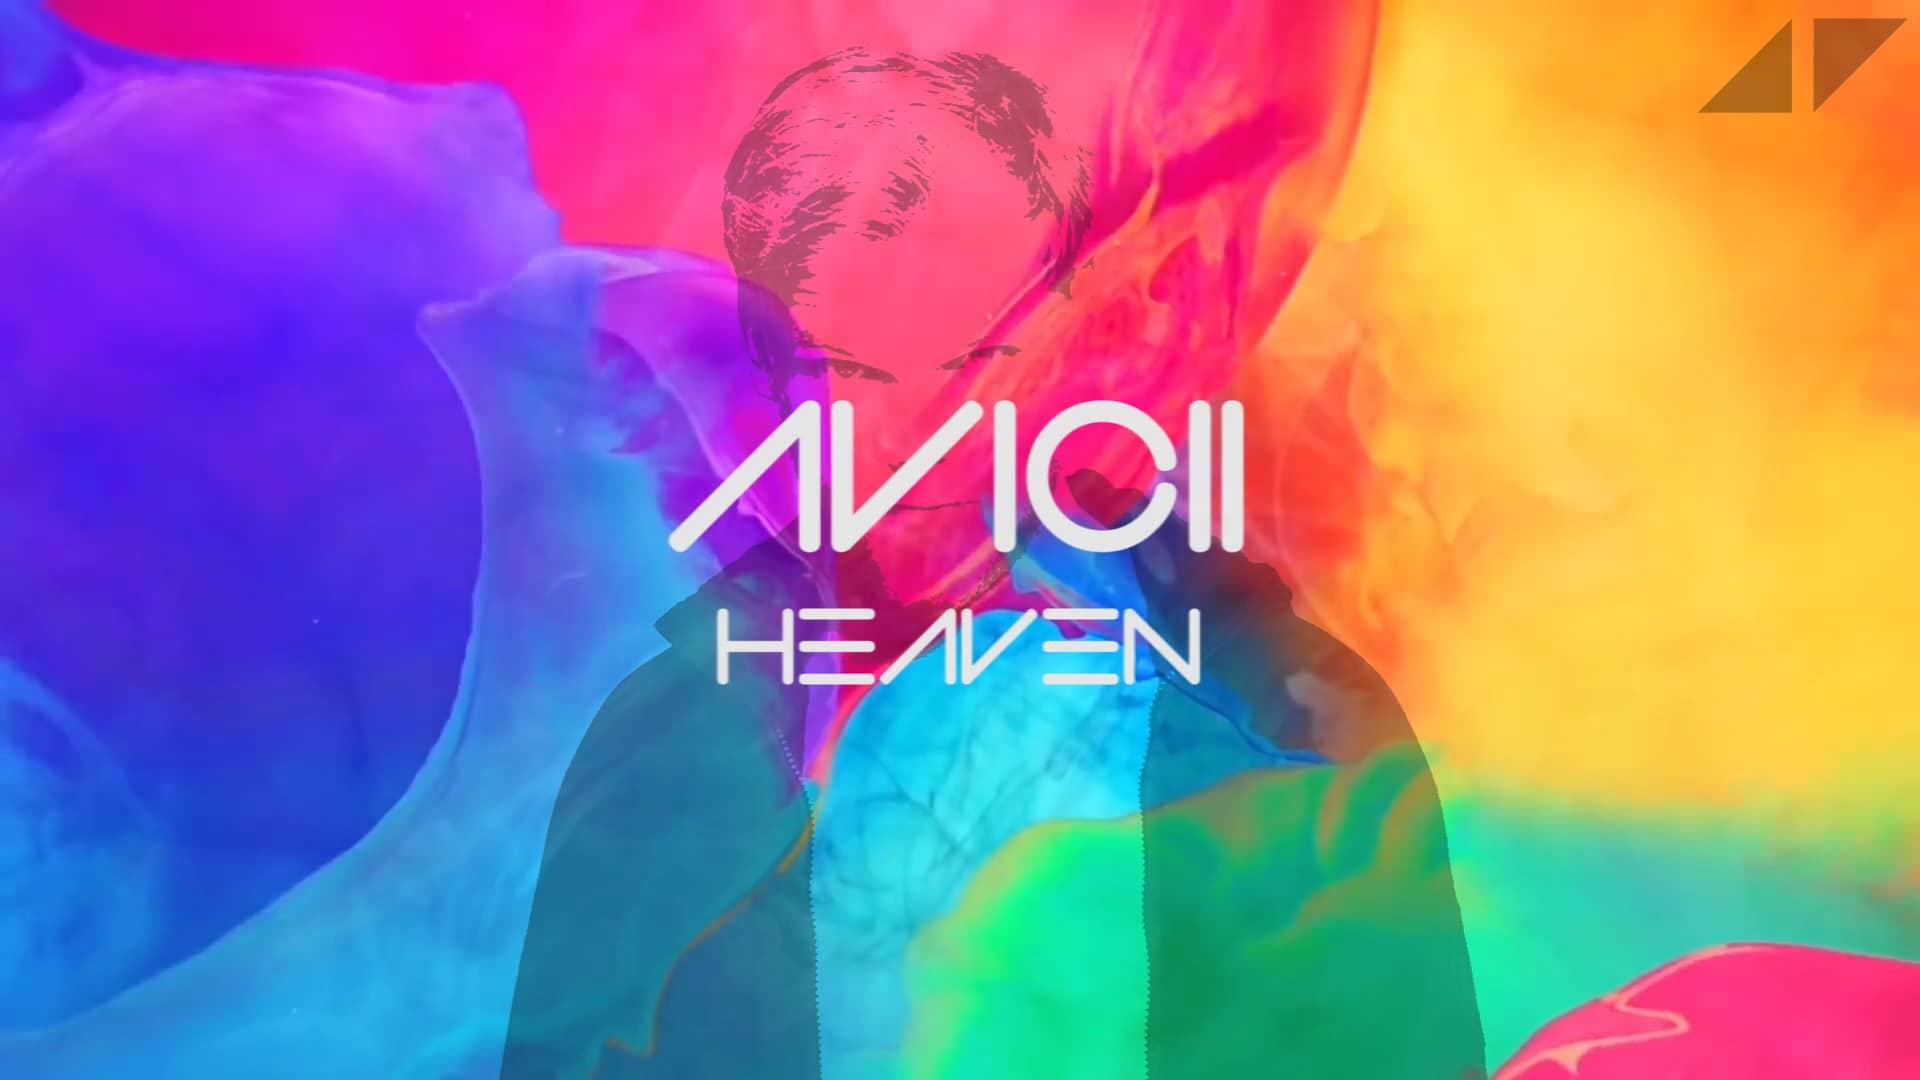 Avicii feat. Chris Martin Heaven1